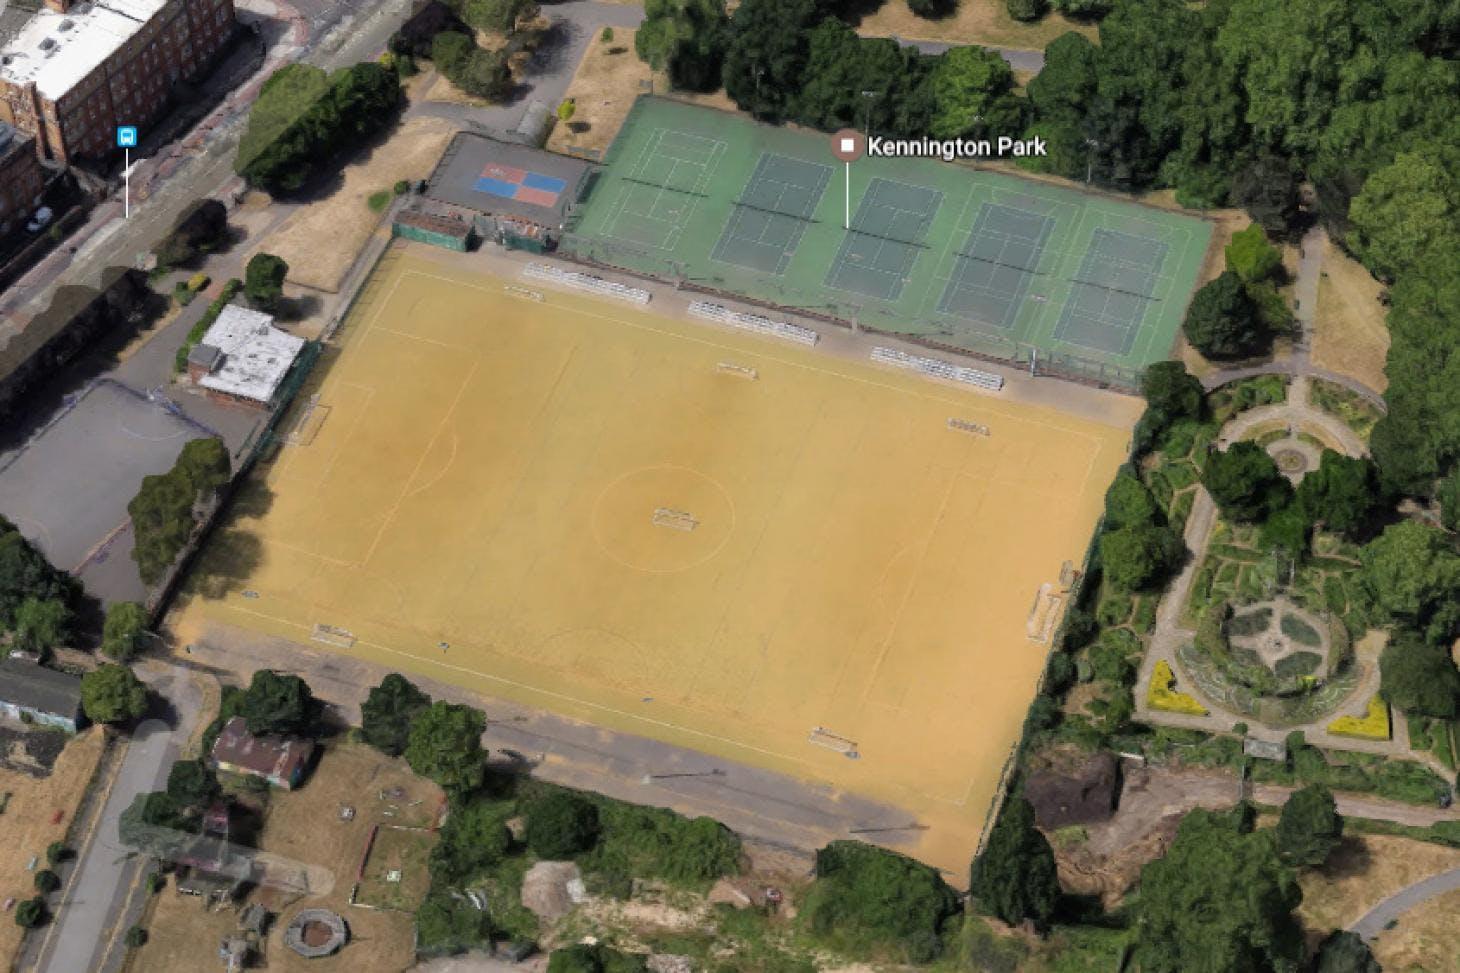 Kennington Park Outdoor | Astroturf hockey pitch